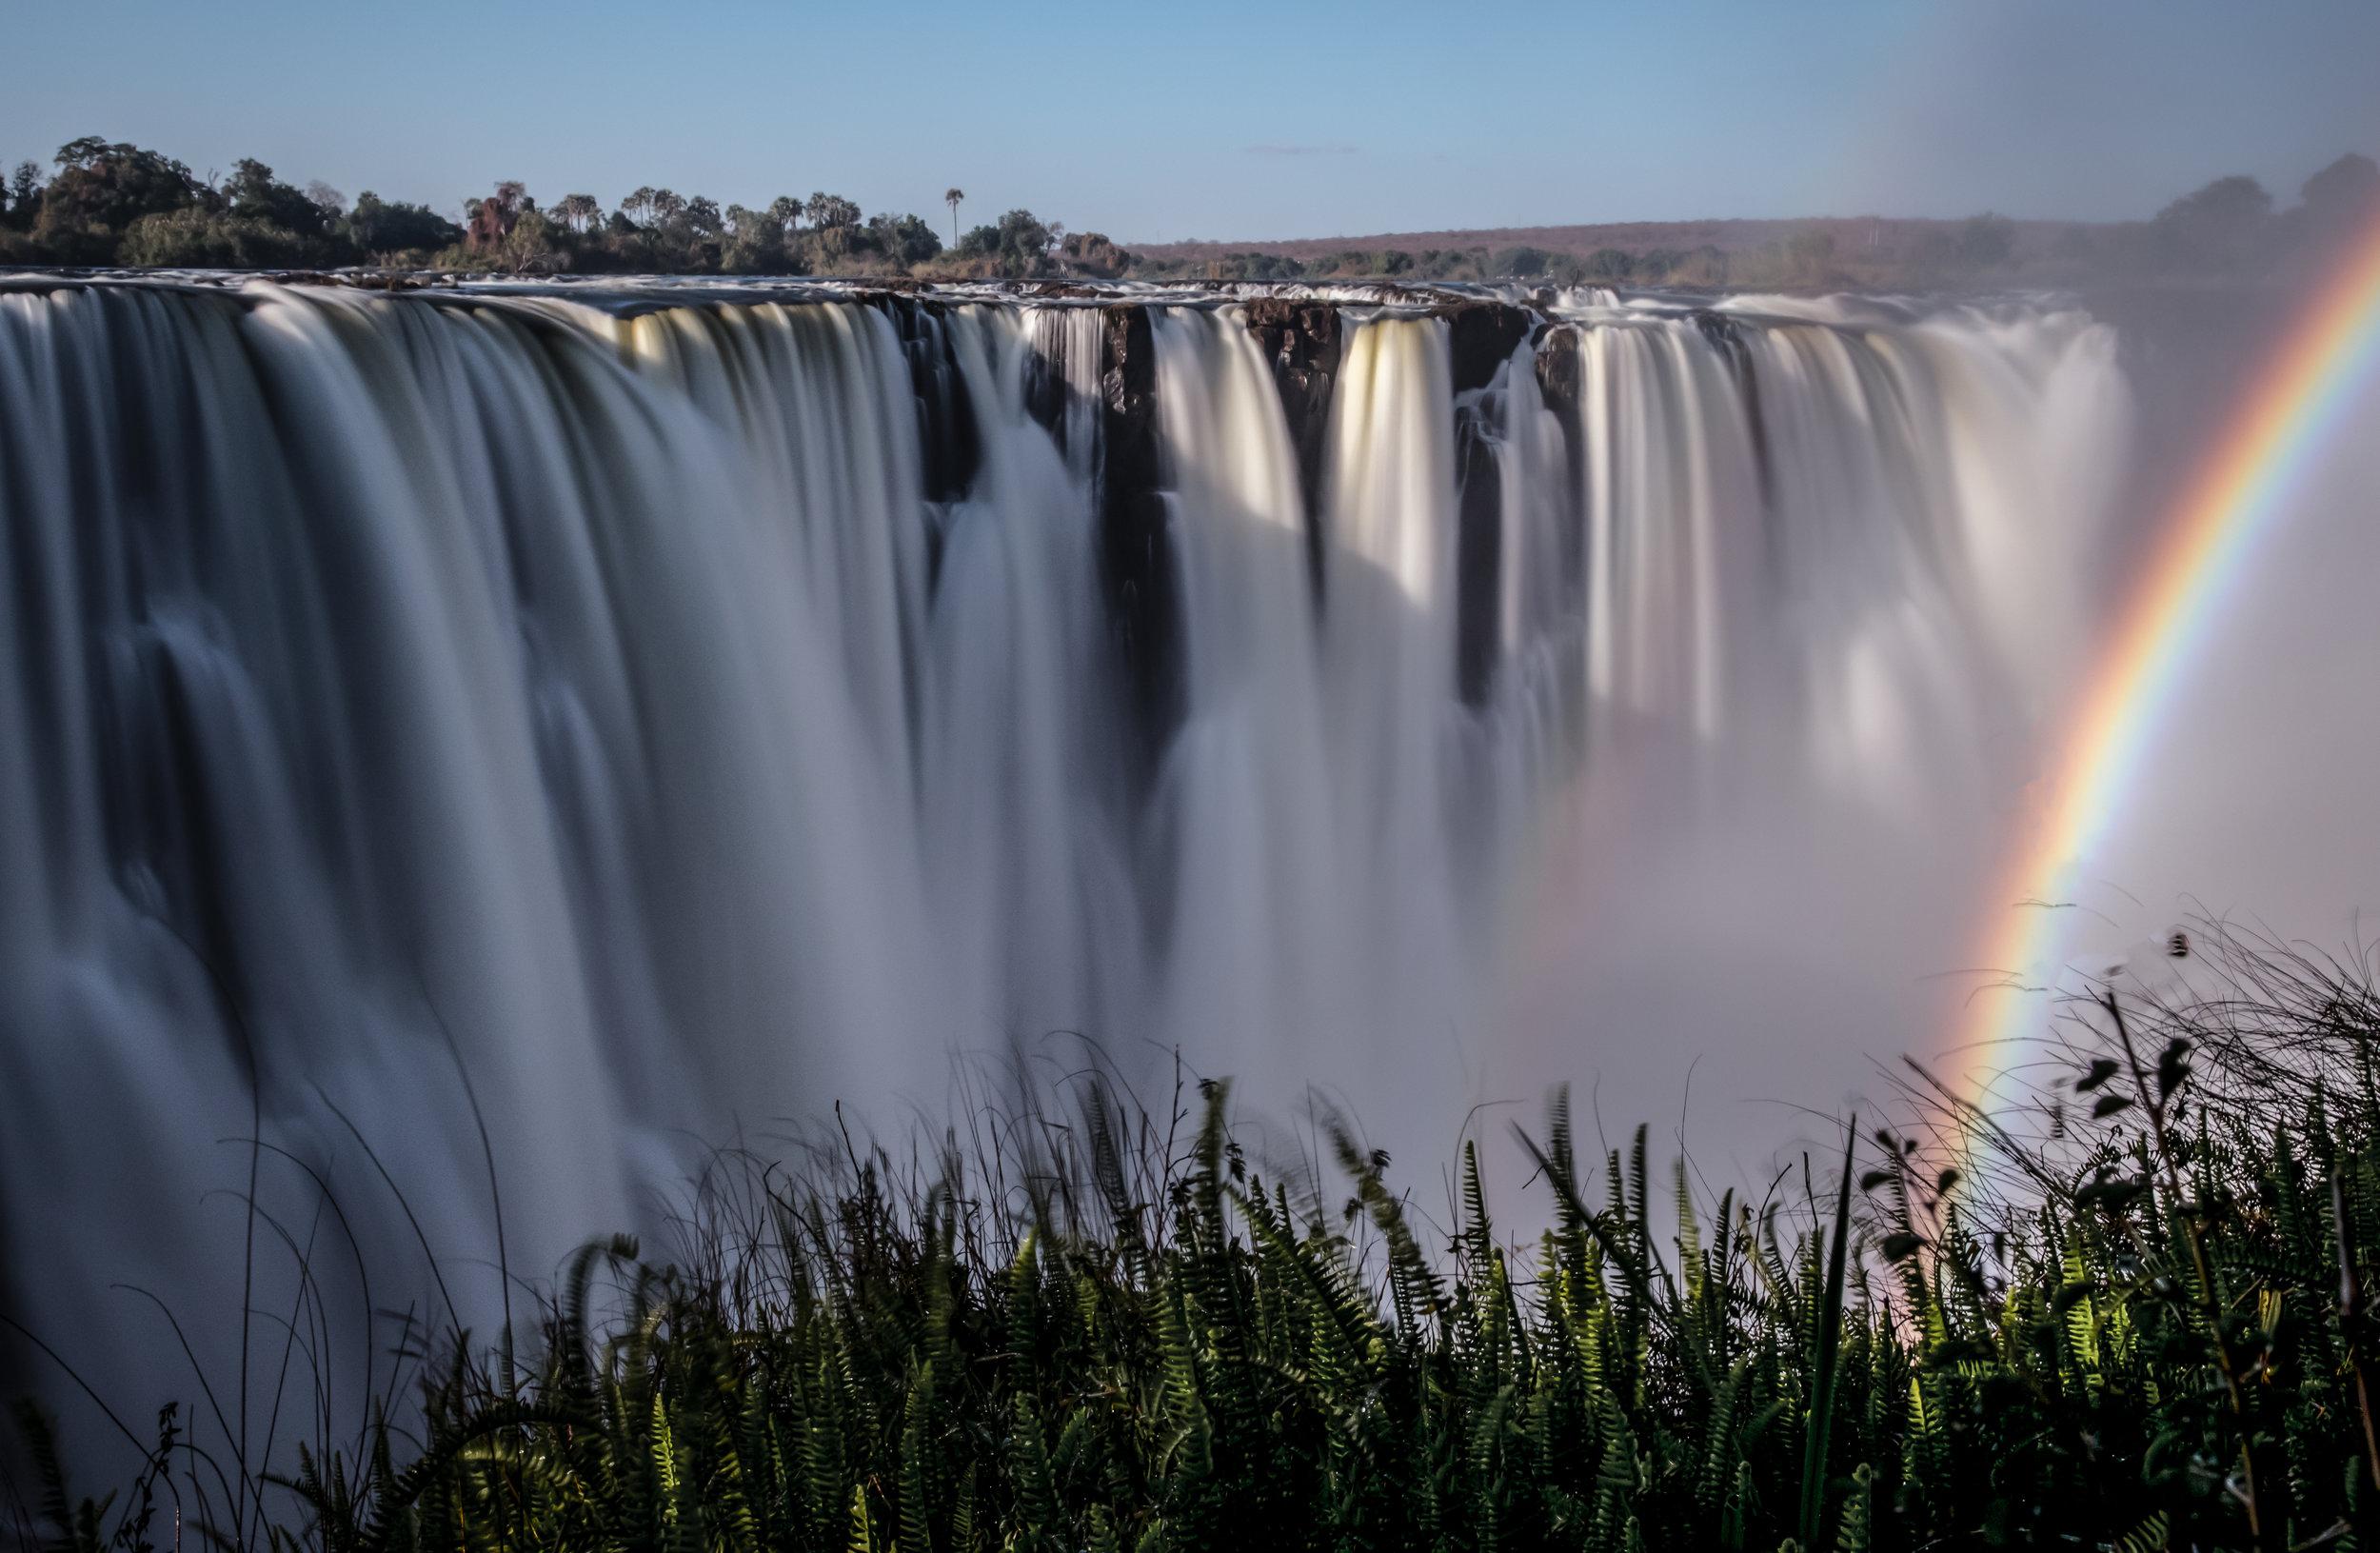 Botswana Safari Revisited cover image